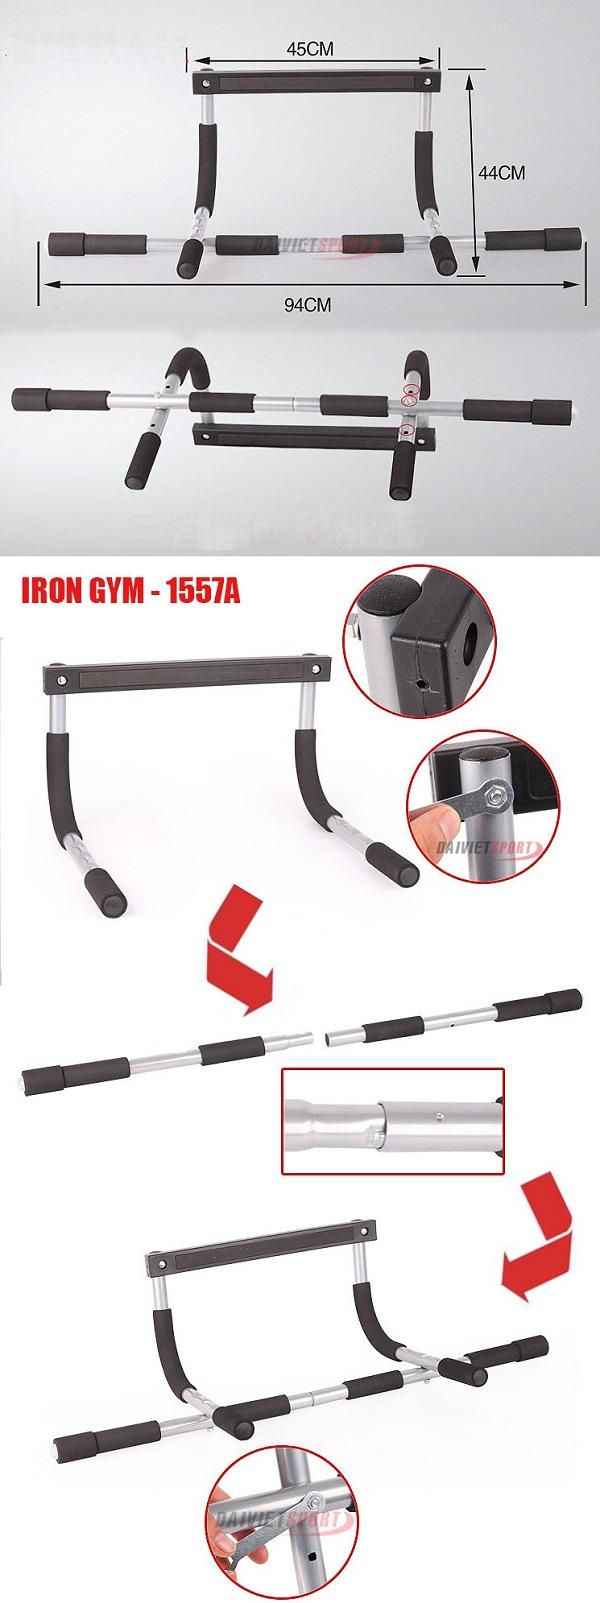 Lắp ráp IRON GYM - 1557A